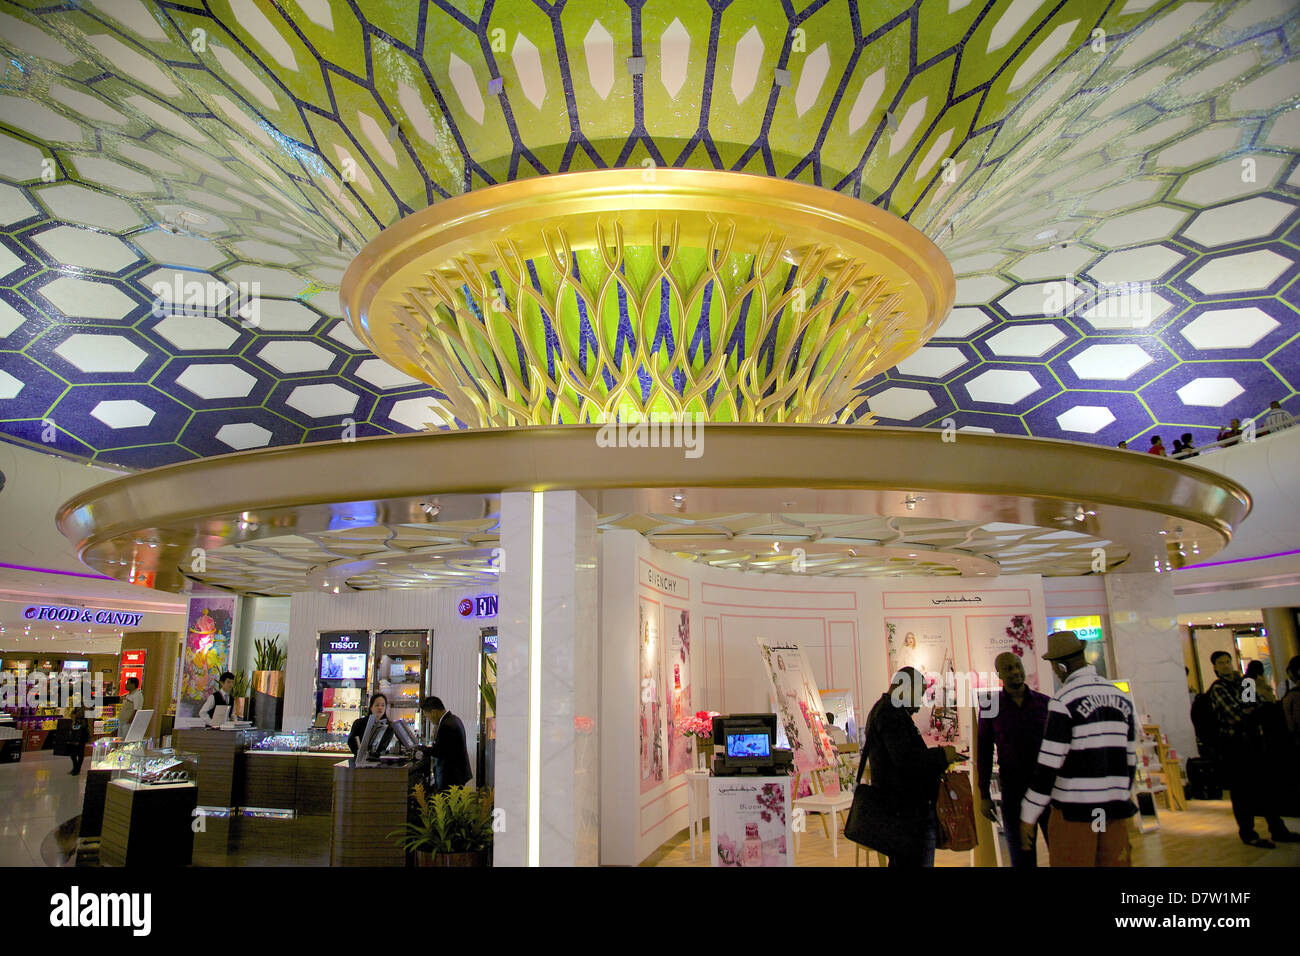 Departure Lounge, International Airport, Abu Dhabi, United Arab Emirates, Middle East - Stock Image